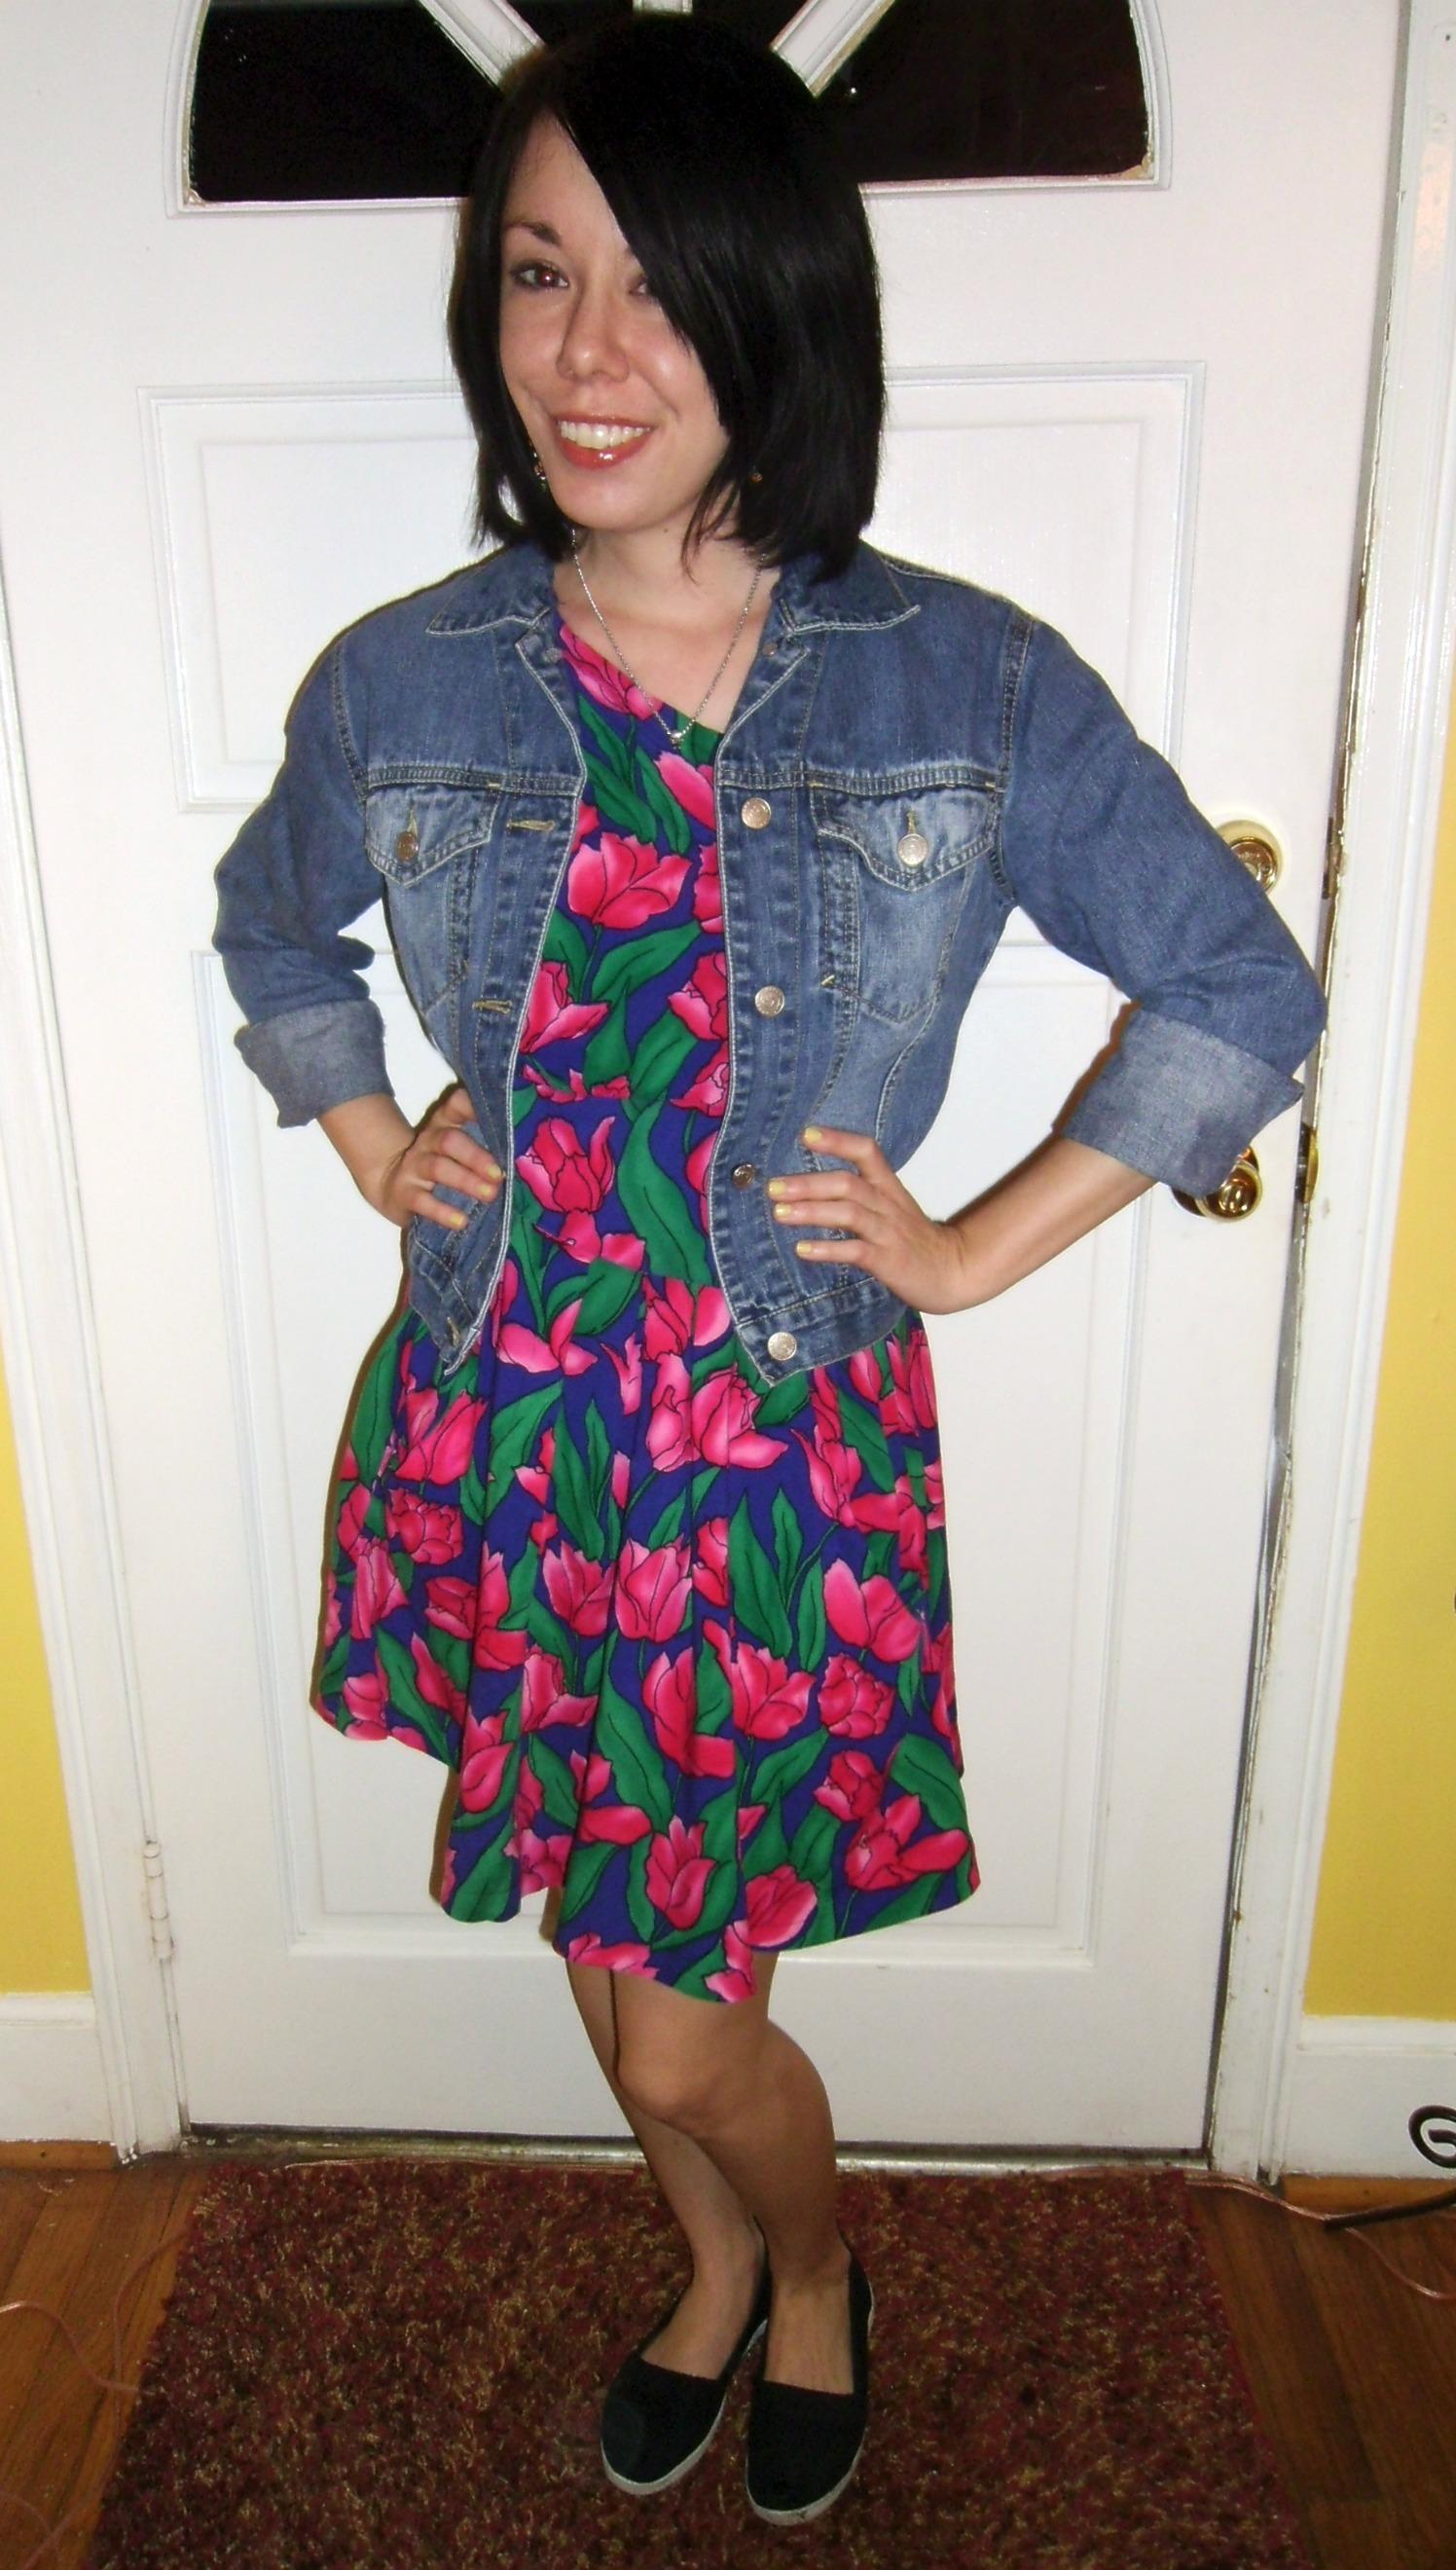 Day 193: Monday Fun Day Dress 11